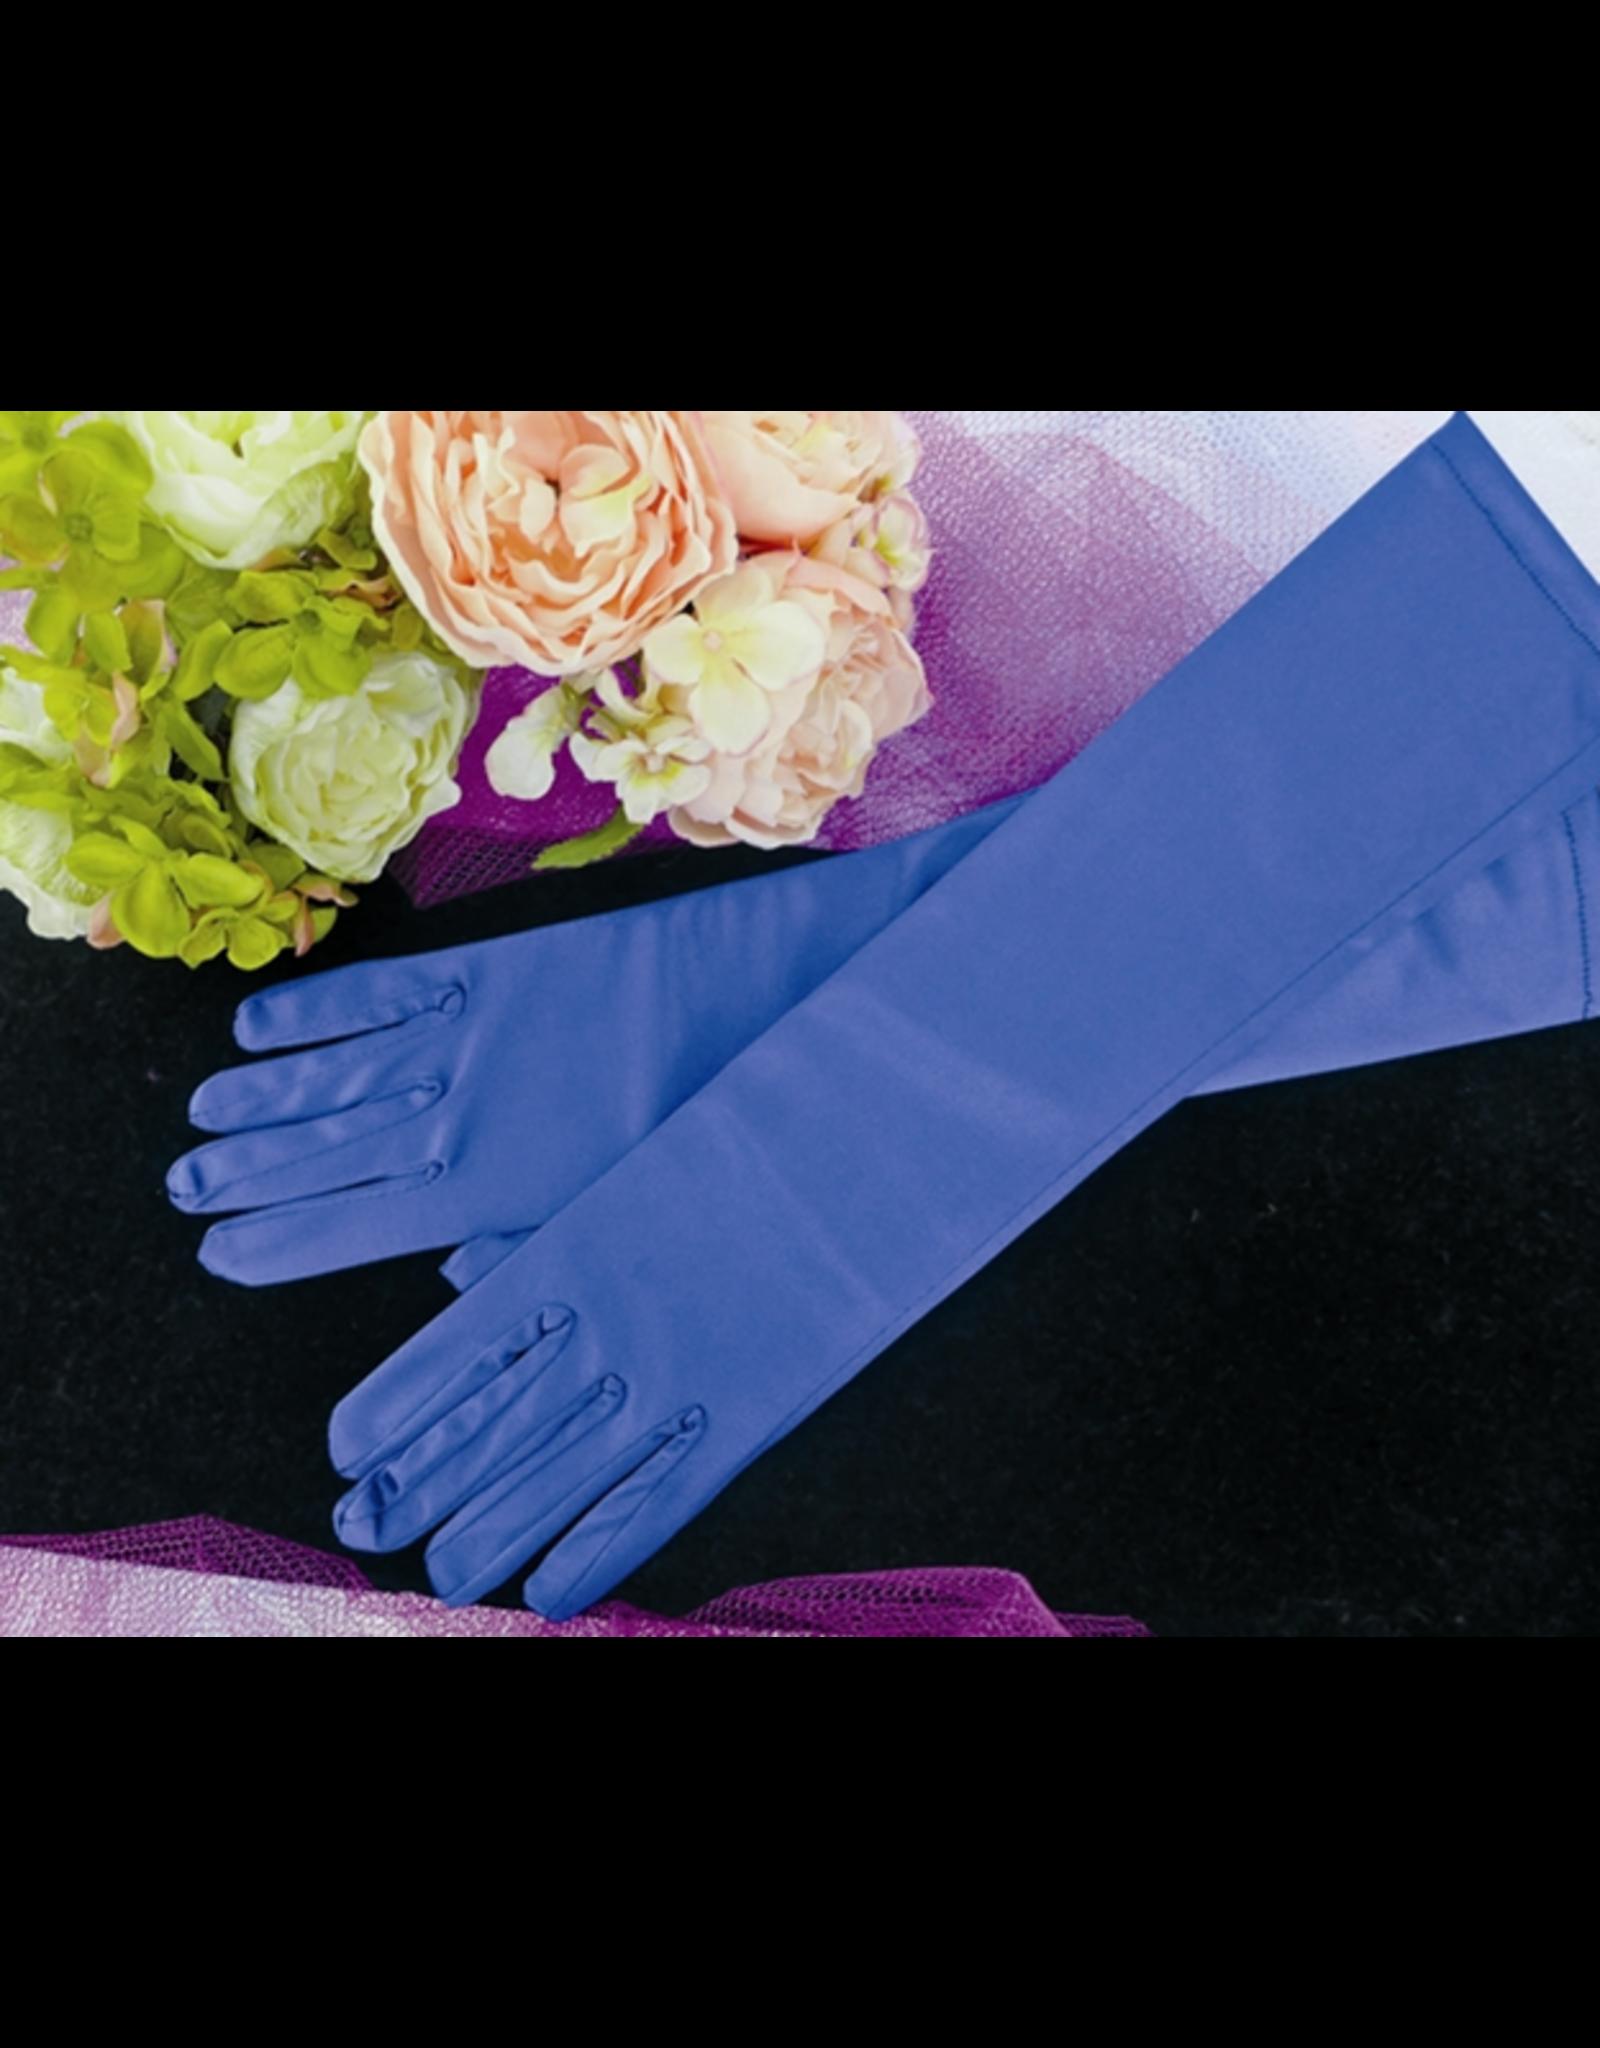 fH2 Long Satin Gloves Royal Blue